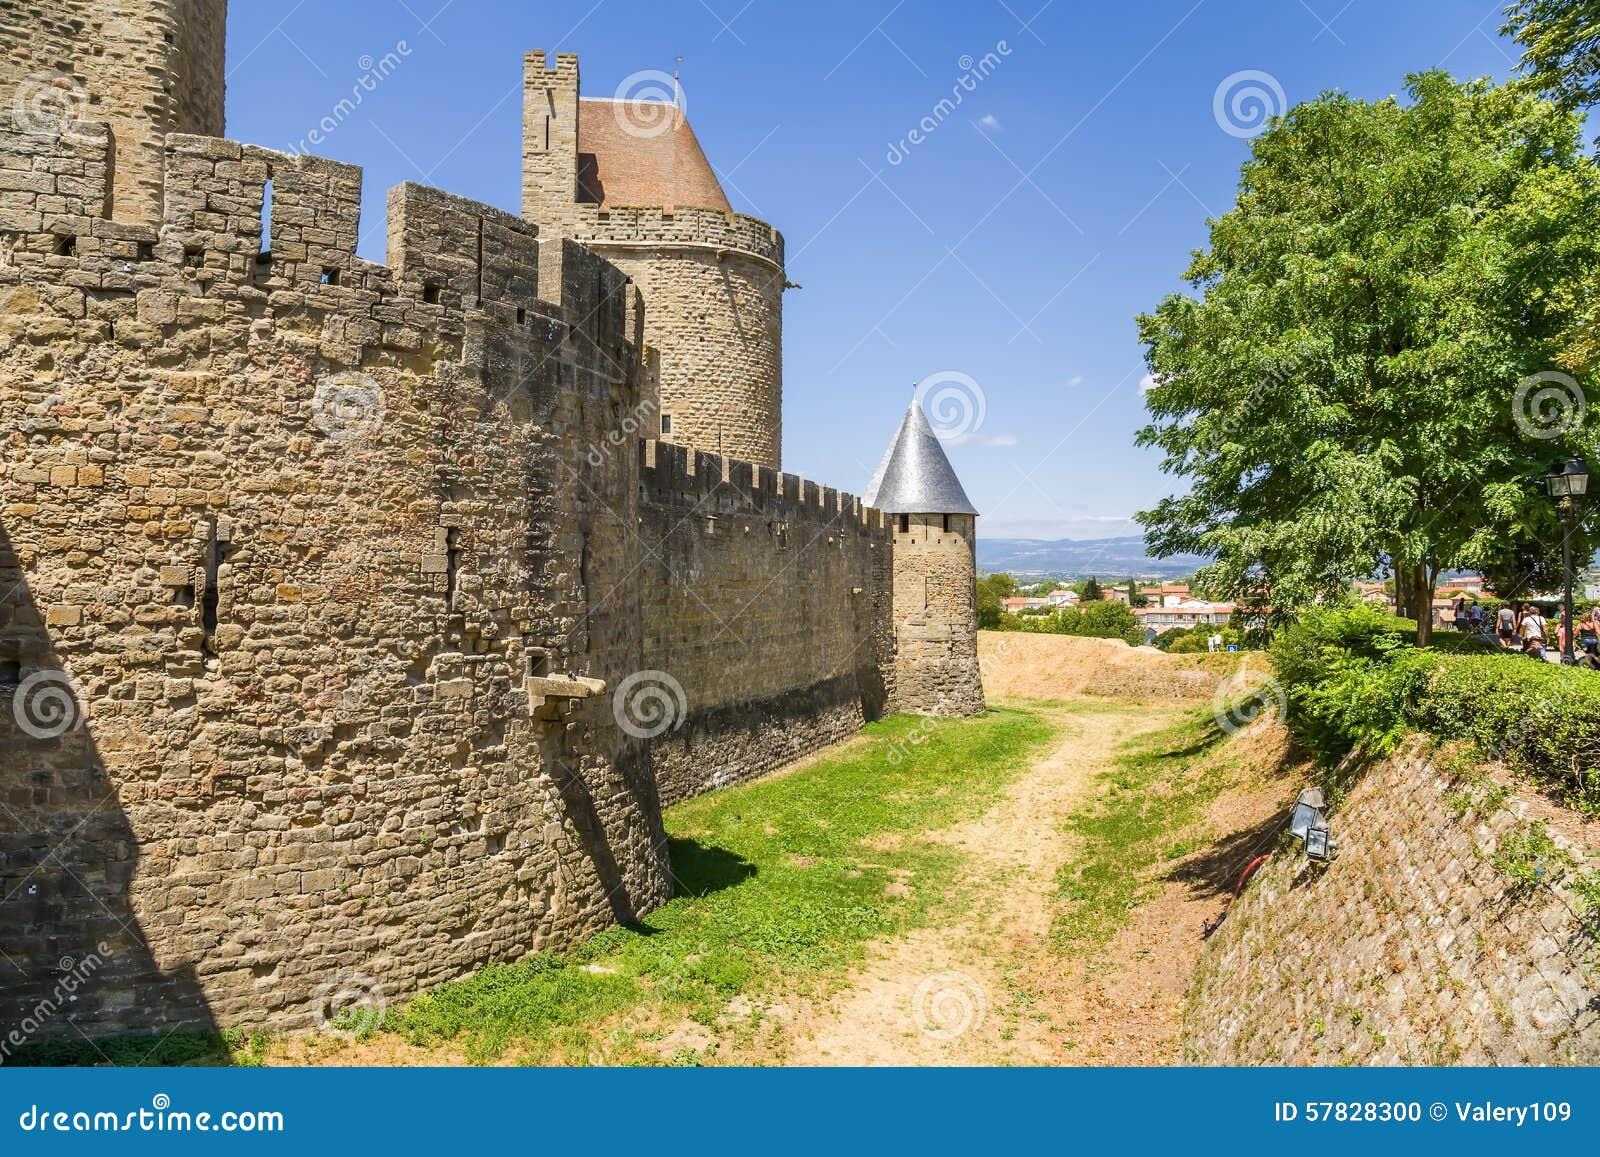 medieval castle in carcassonne france unesco list stock photo image 57828300. Black Bedroom Furniture Sets. Home Design Ideas